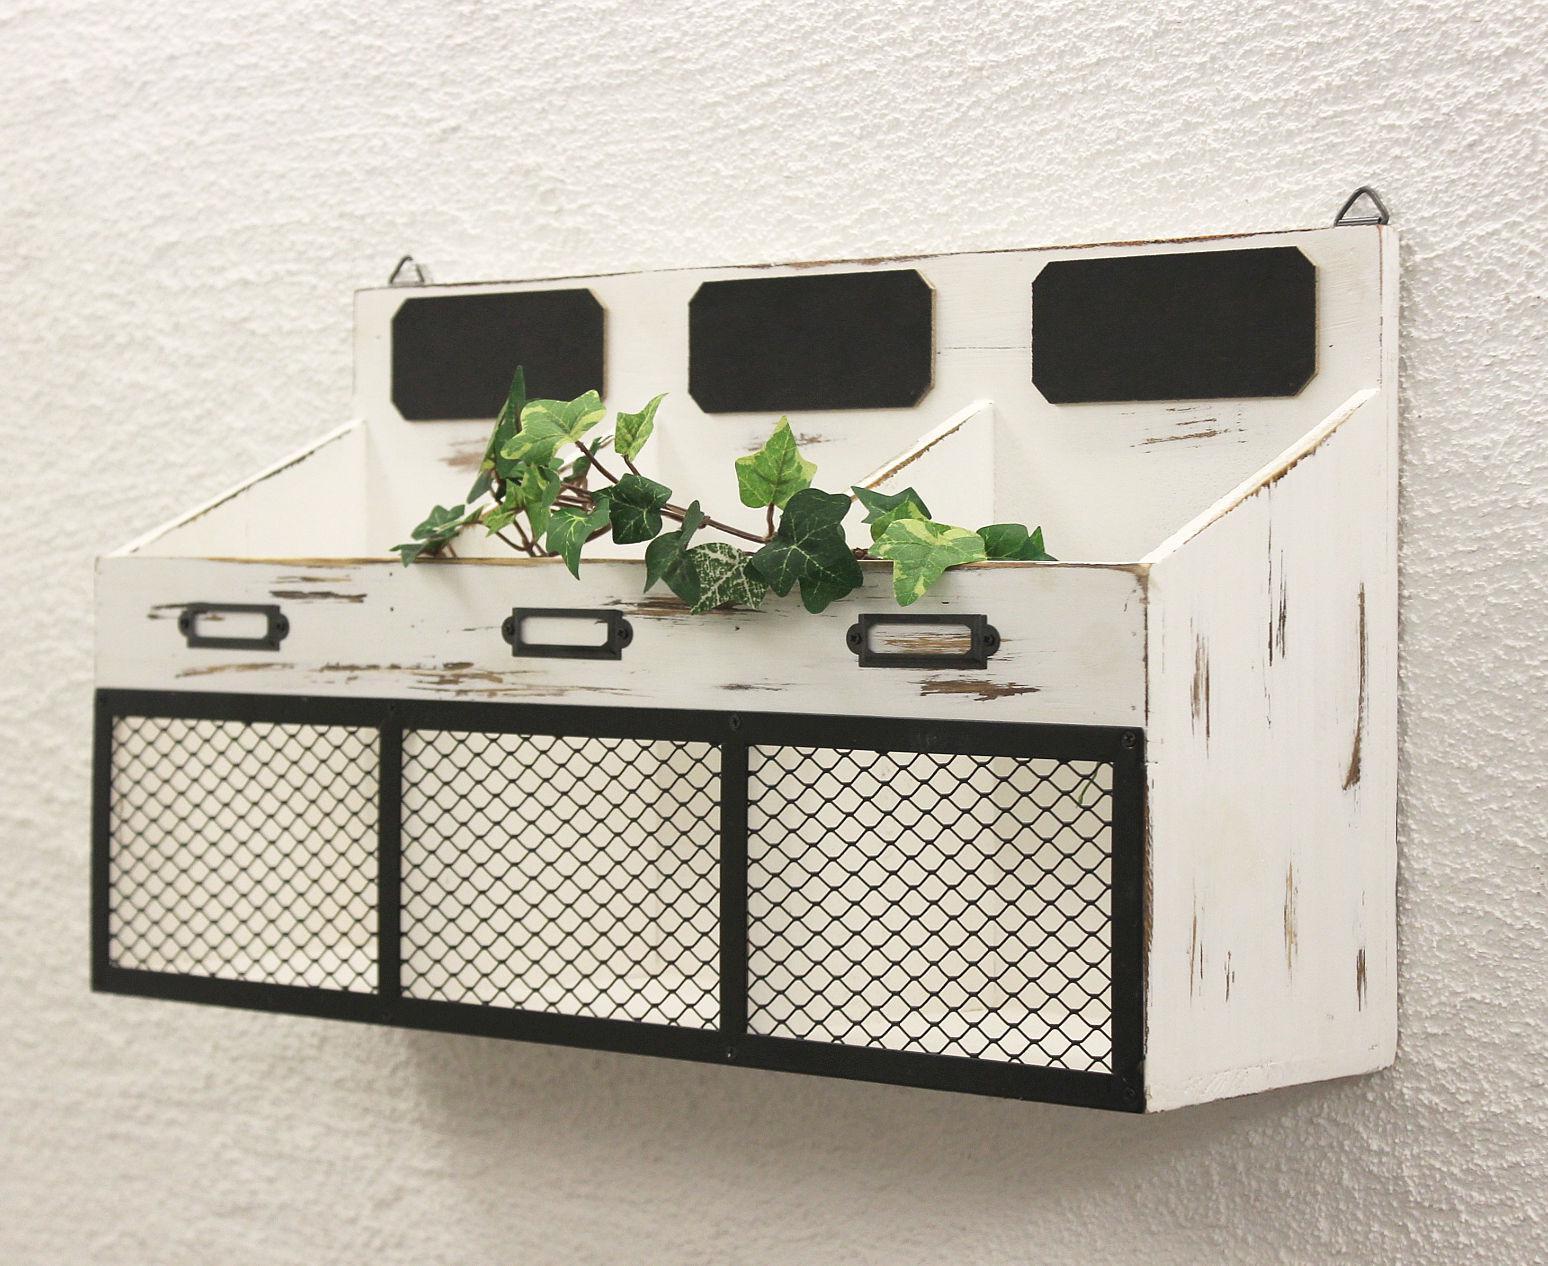 wandregal yx 13b440 wei 48 cm setzkasten sammlervitrine k chenregal regal ebay. Black Bedroom Furniture Sets. Home Design Ideas